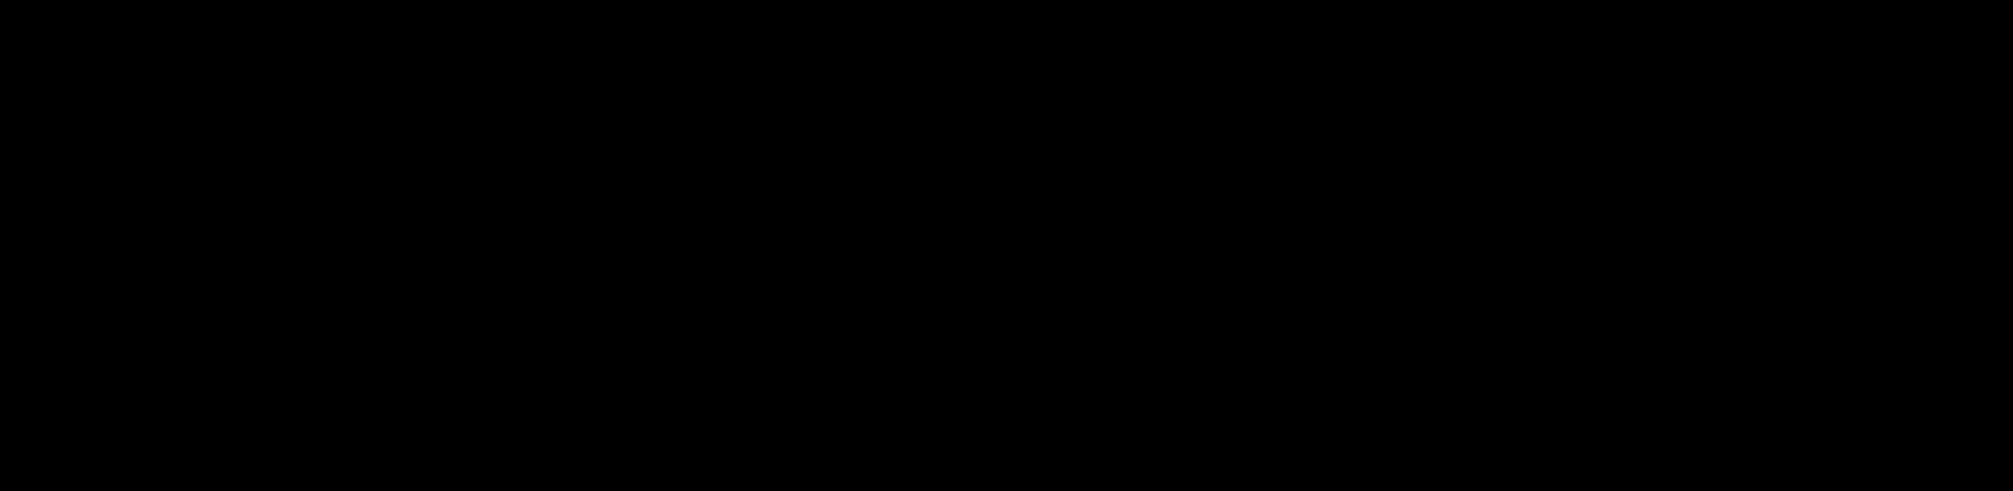 logo_hejhej-mats